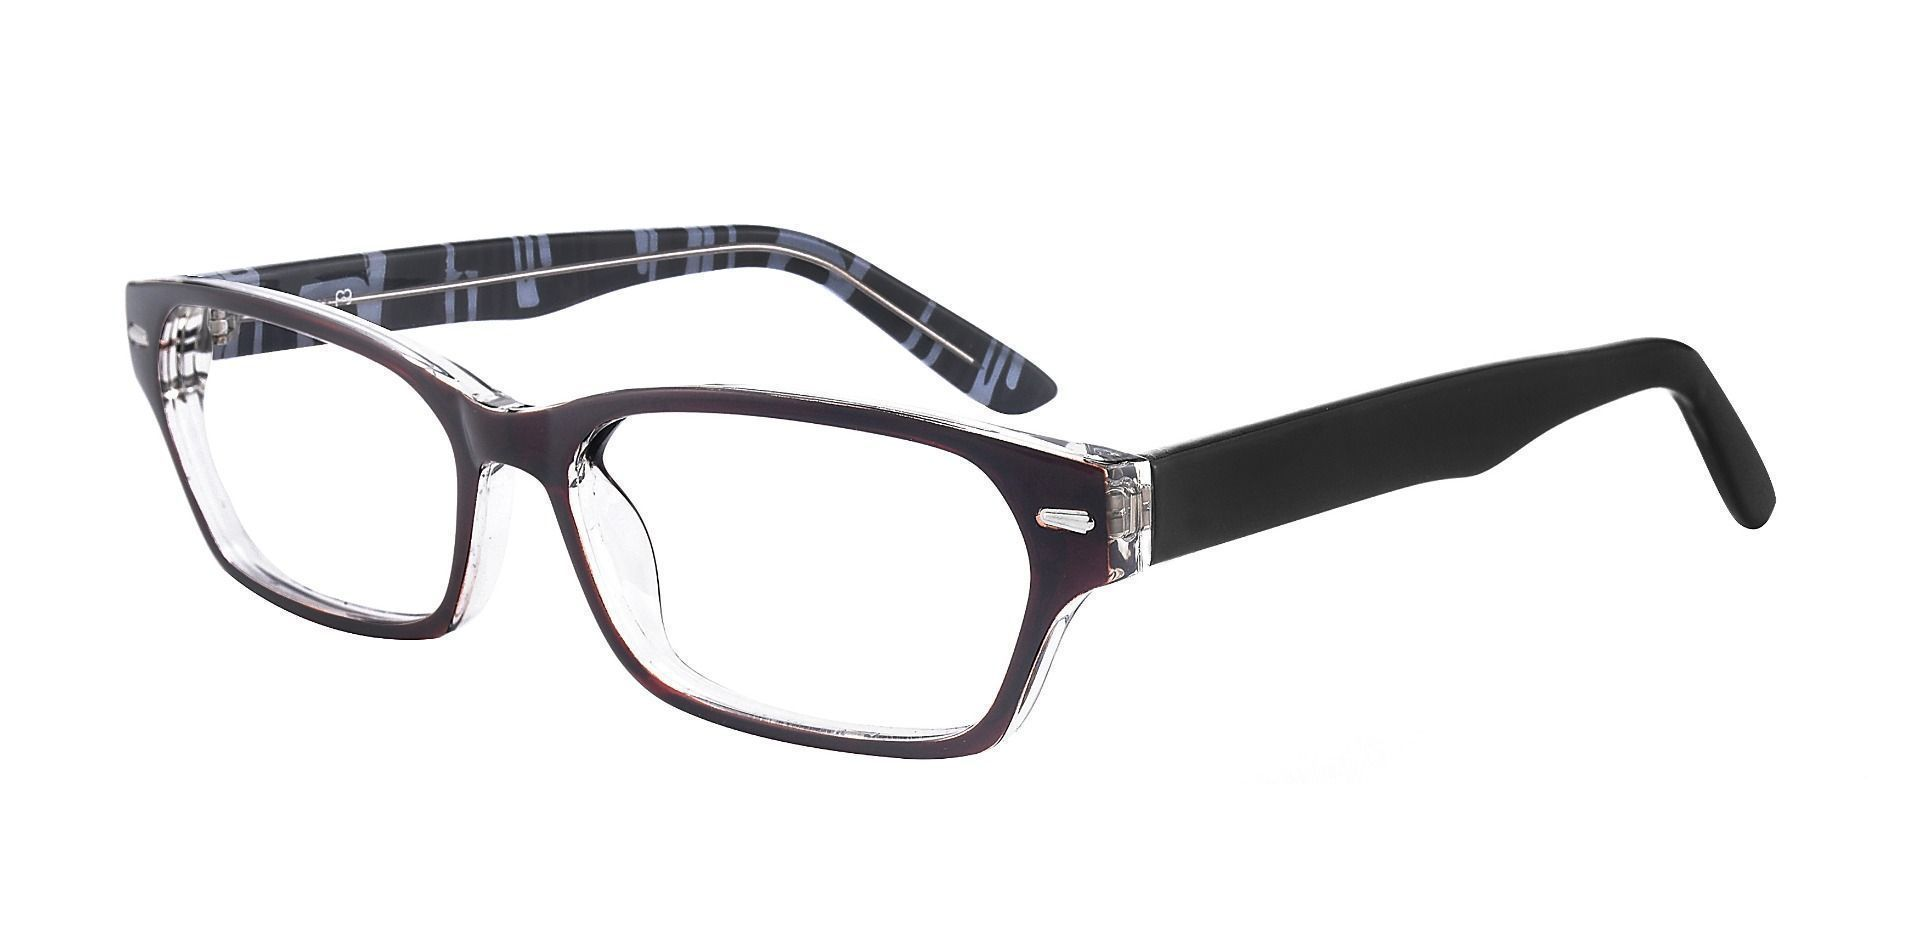 Wagner Rectangle Progressive Glasses - Brown